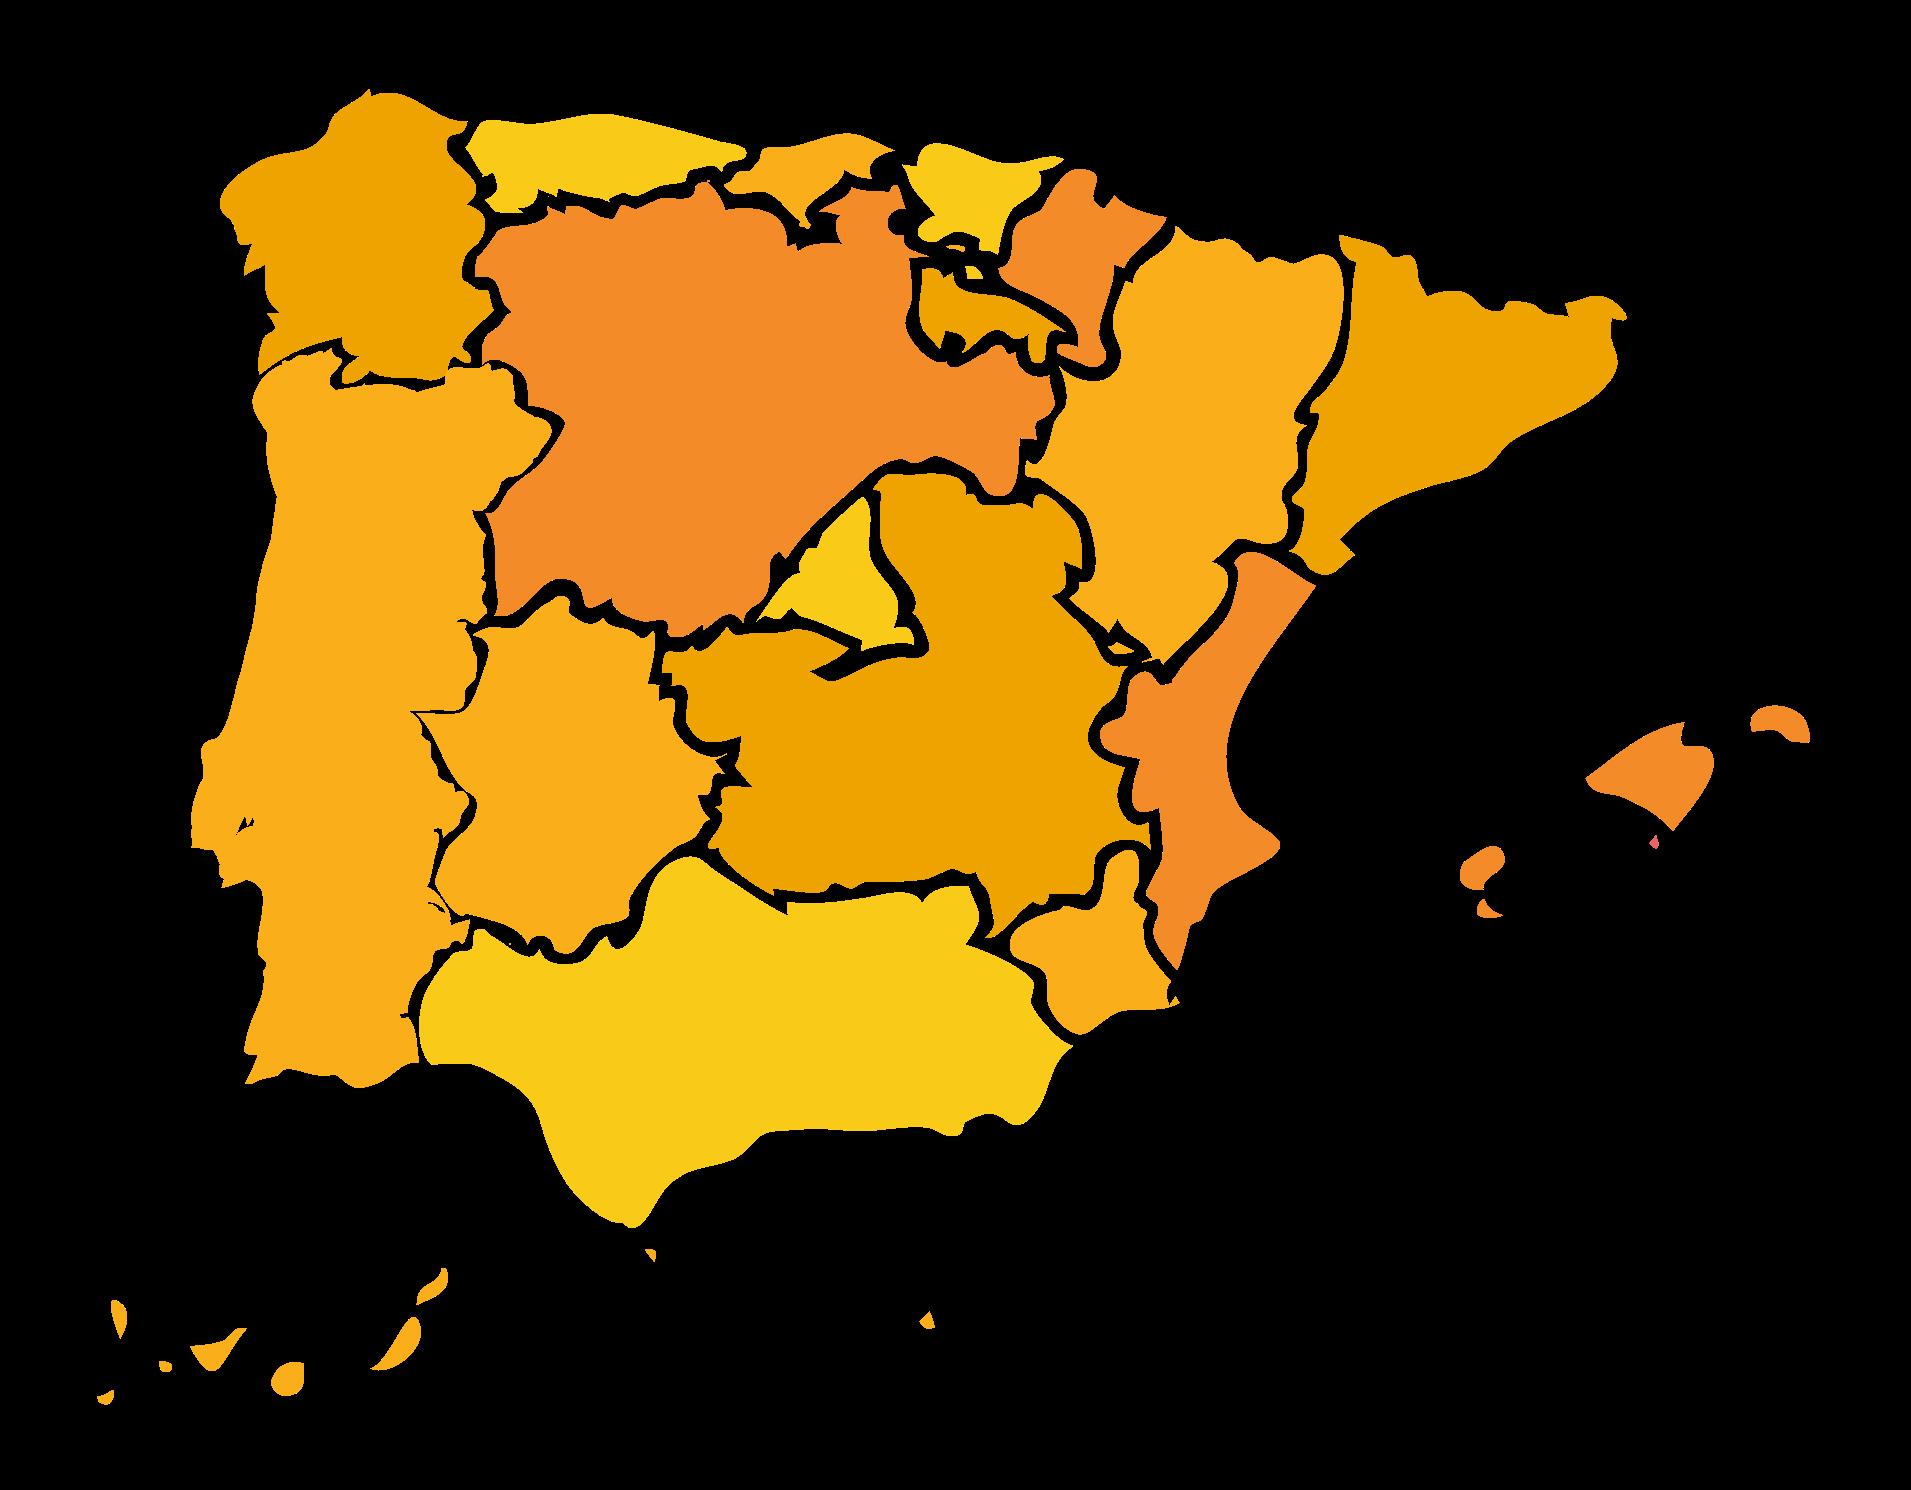 sat espana 2 - Technical service